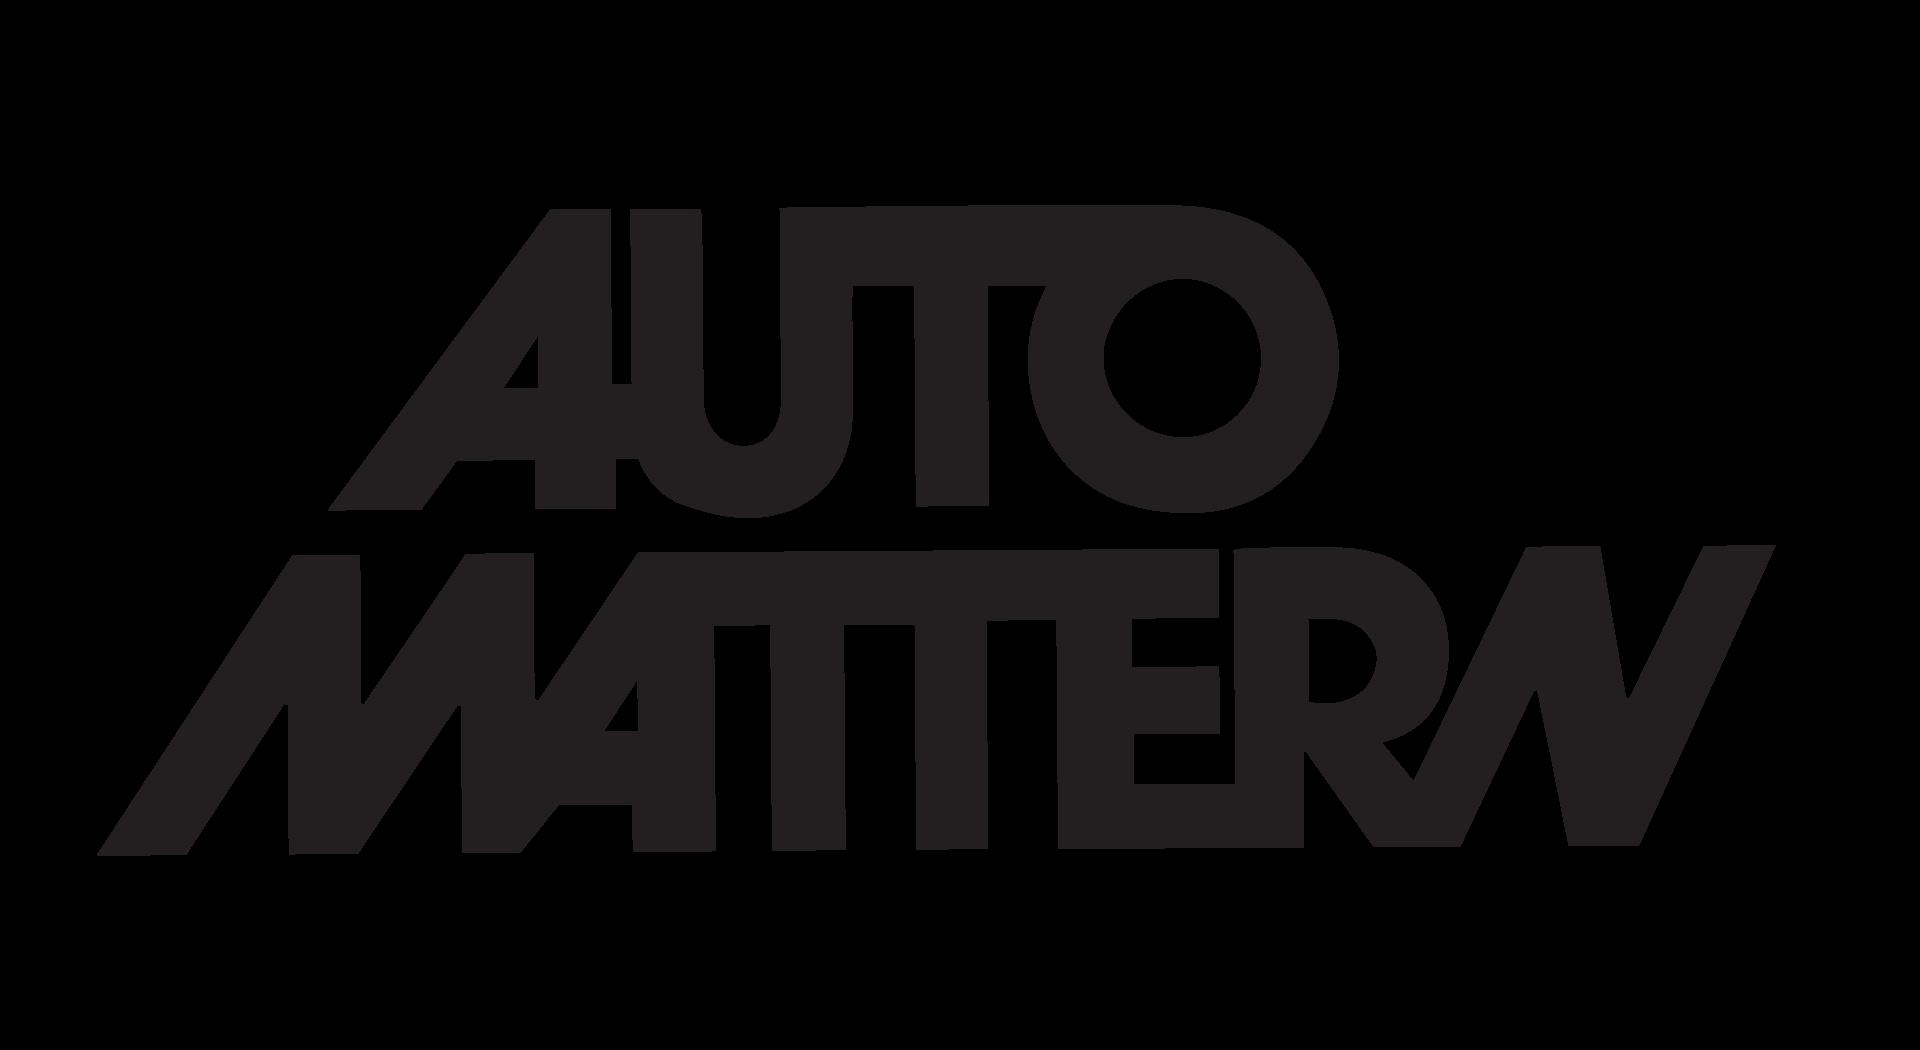 Auto Mattern Logo